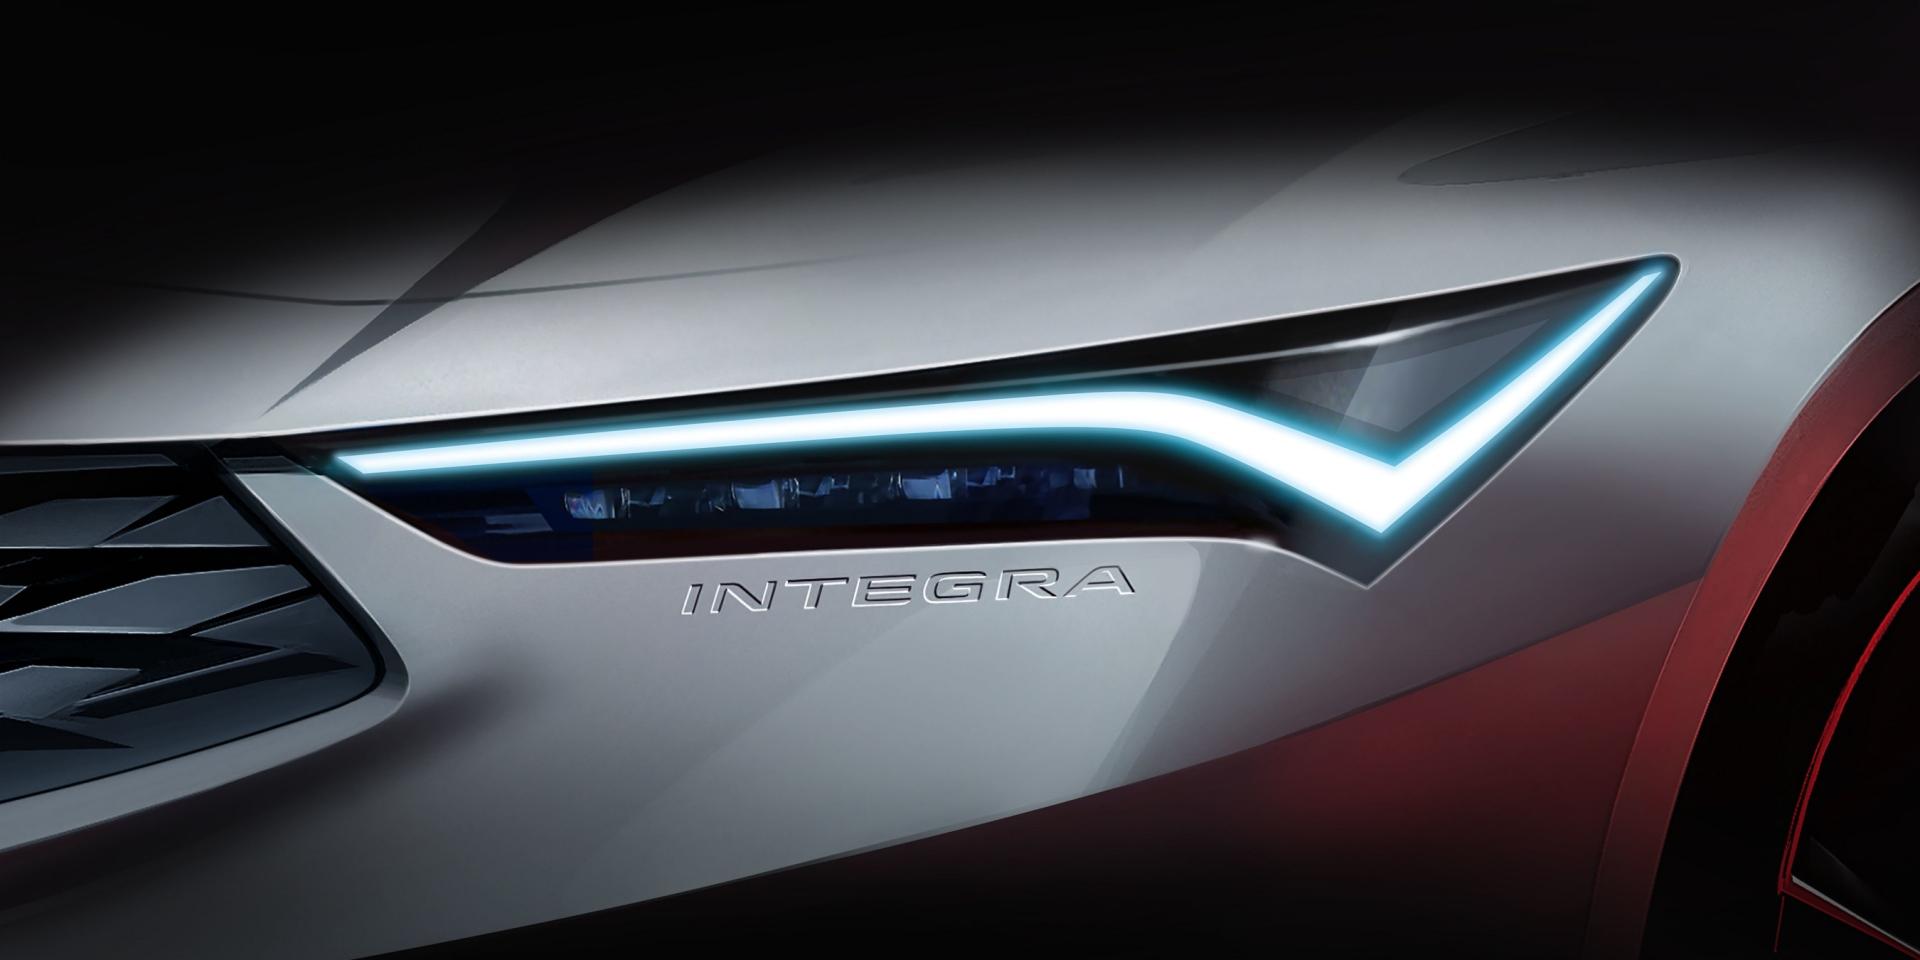 Honda Integra強勢回歸!掛上Acura廠徽在圓石灘發表!